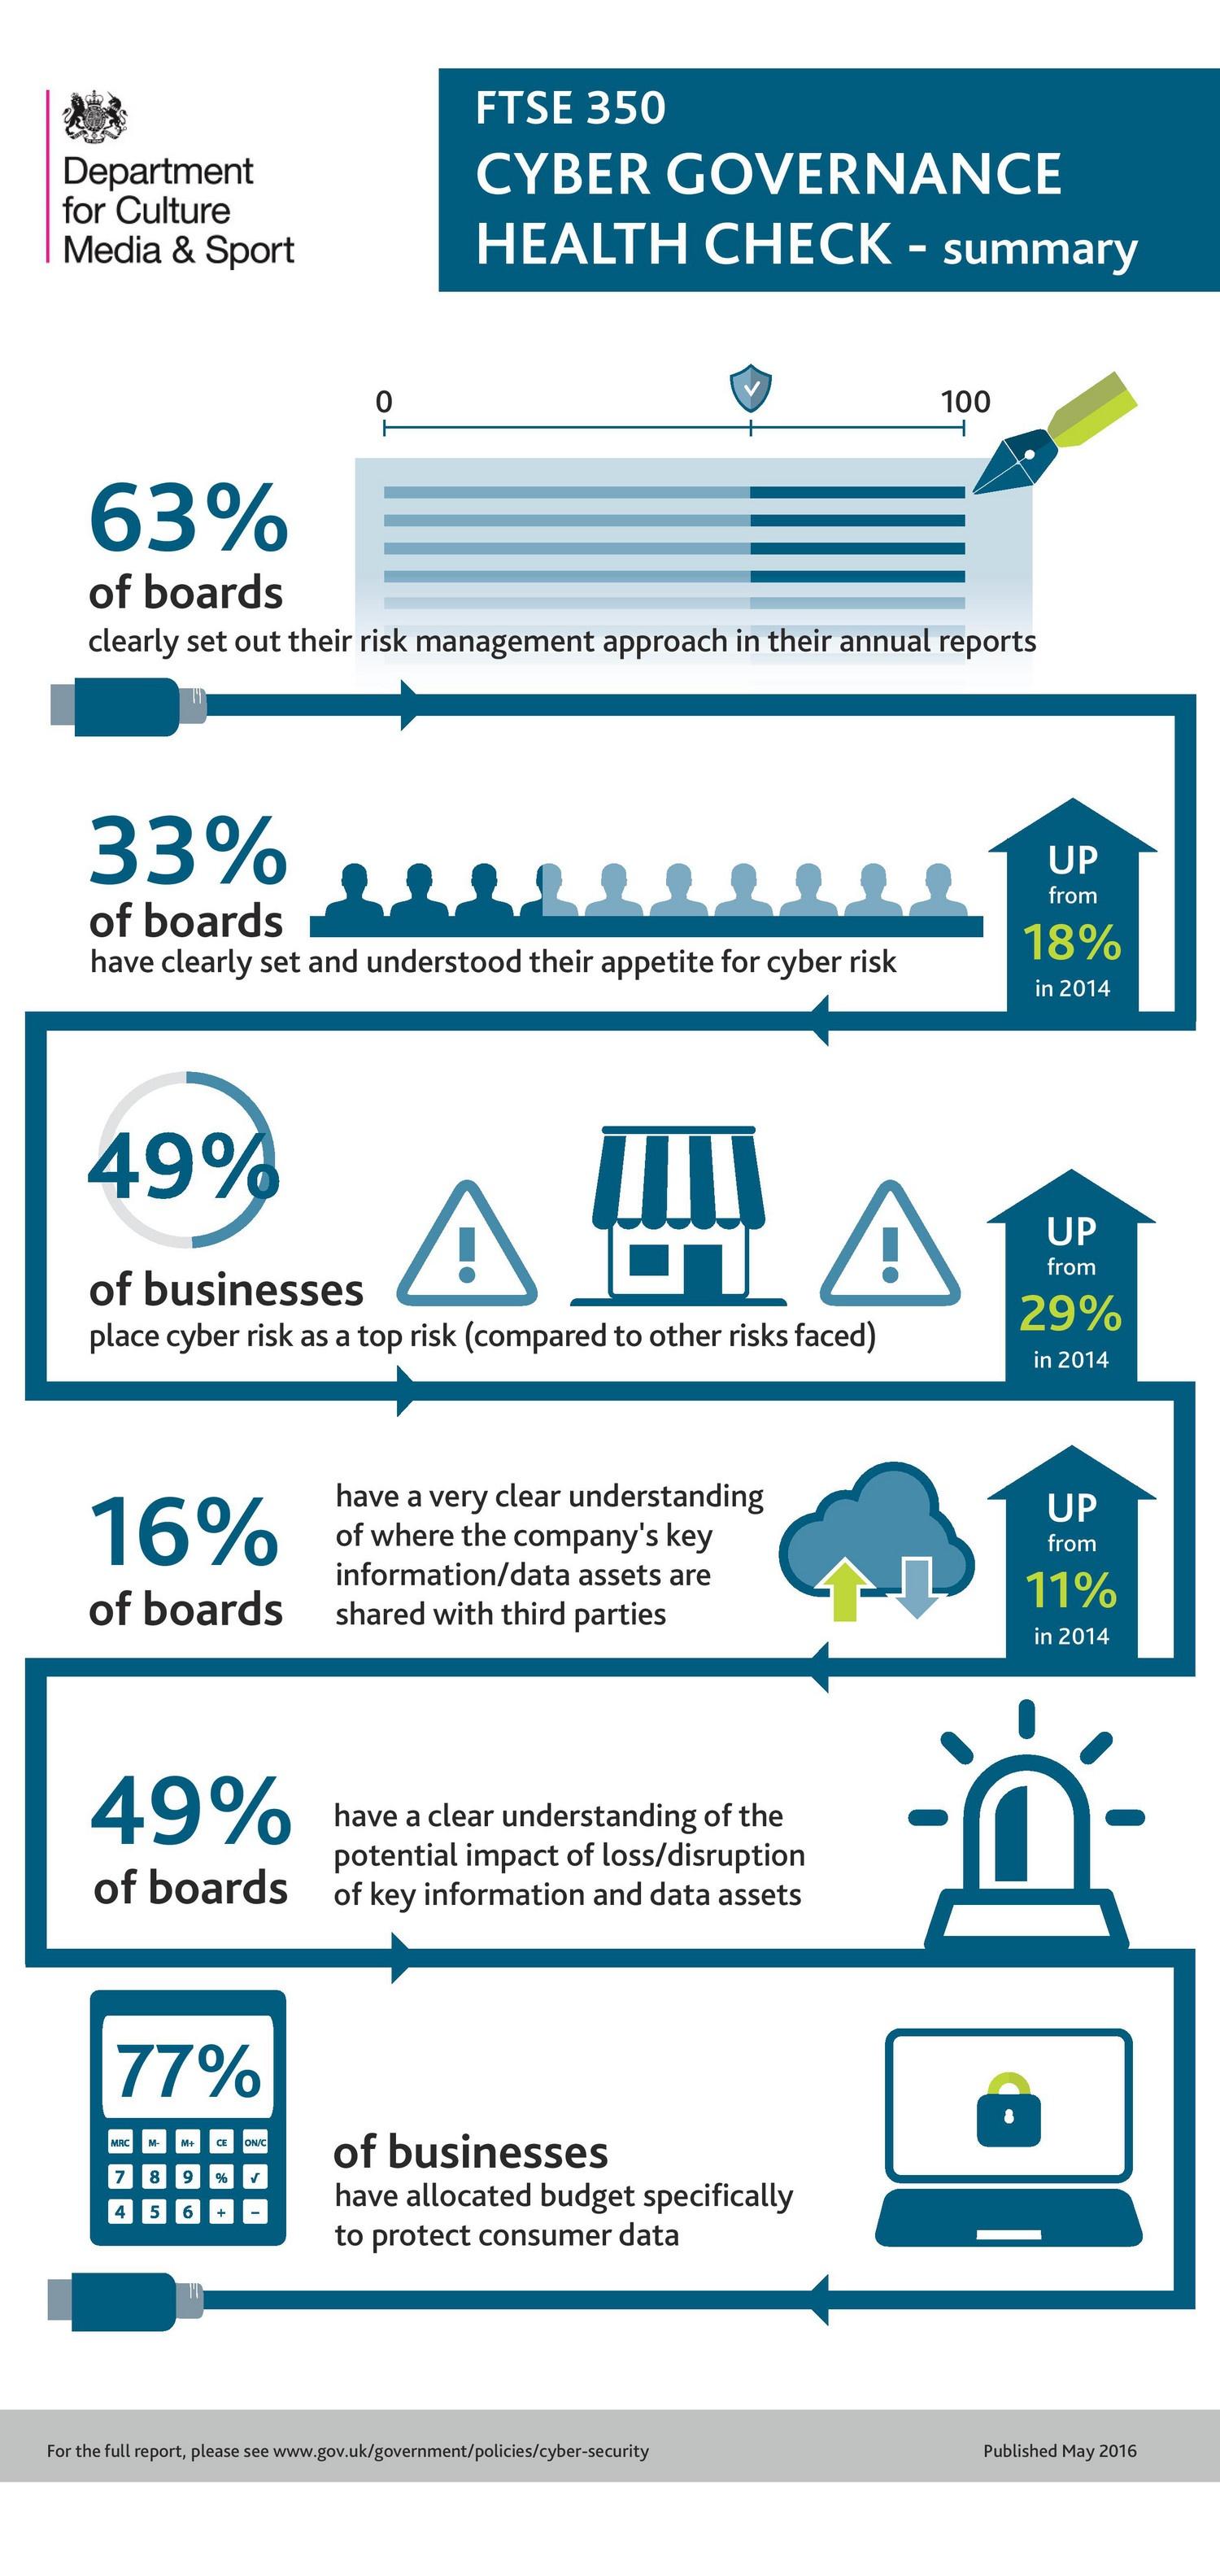 Cyber_Governance_Health_Check_infographic_2015.jpg